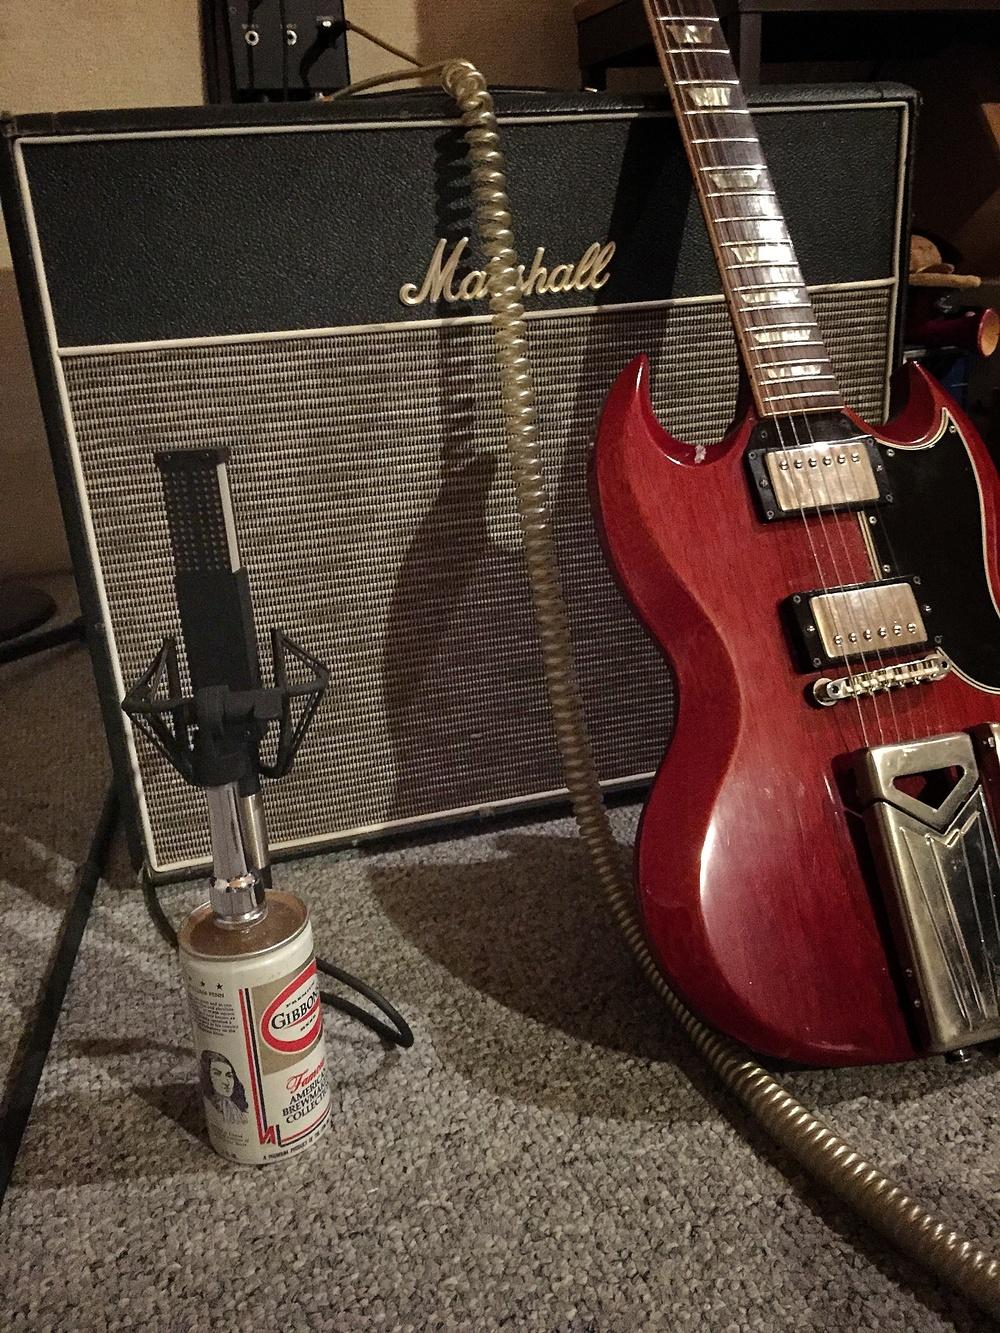 gibbons-ale-guitar-vr2.jpg